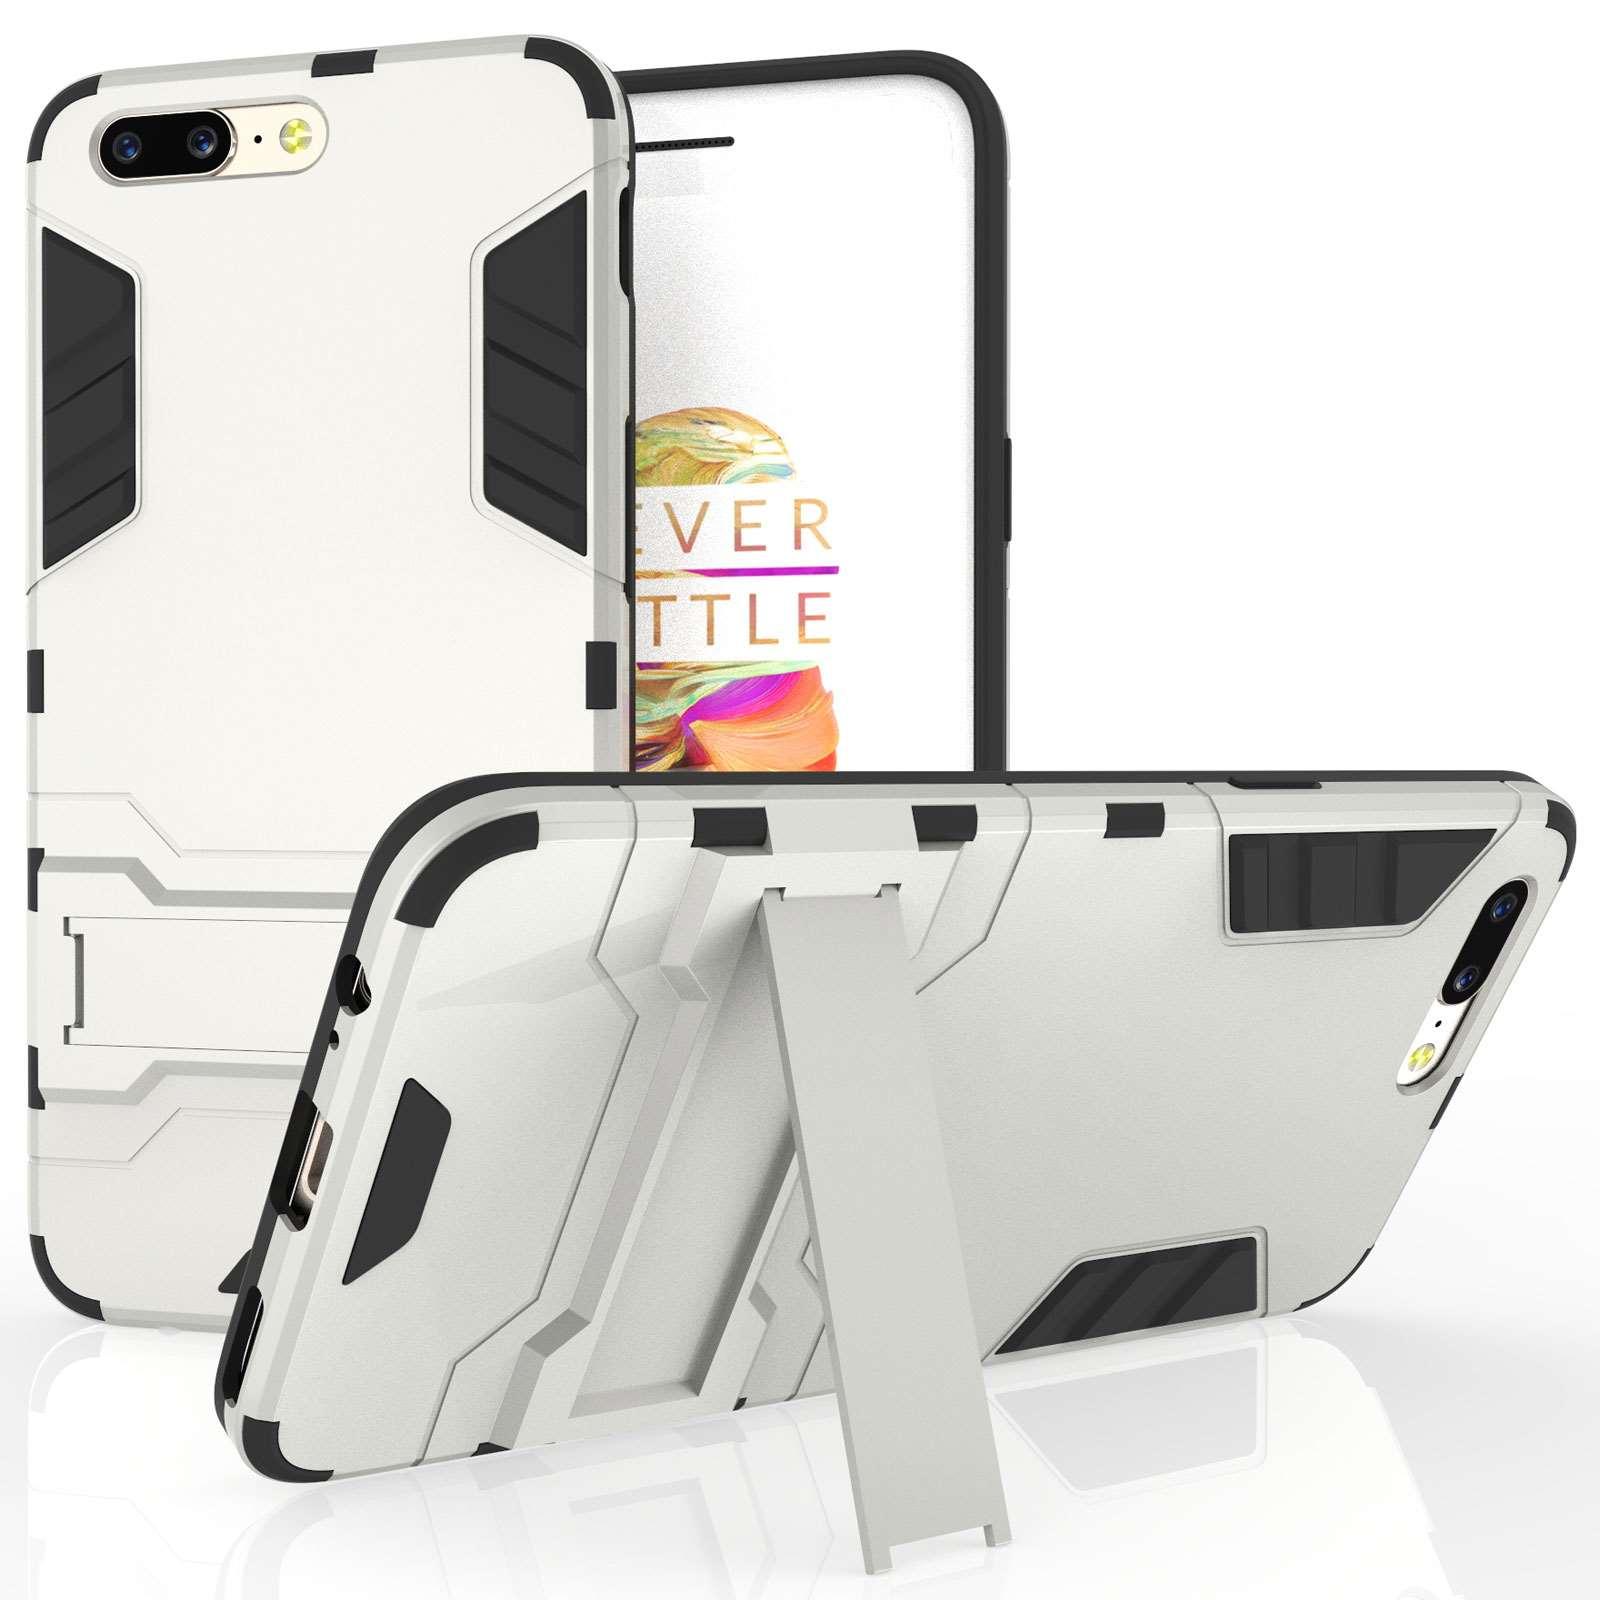 Caseflex Ανθεκτική Dual Layer Θήκη με Stand OnePlus 5 - Steel Silver  (X000QHMX7N)